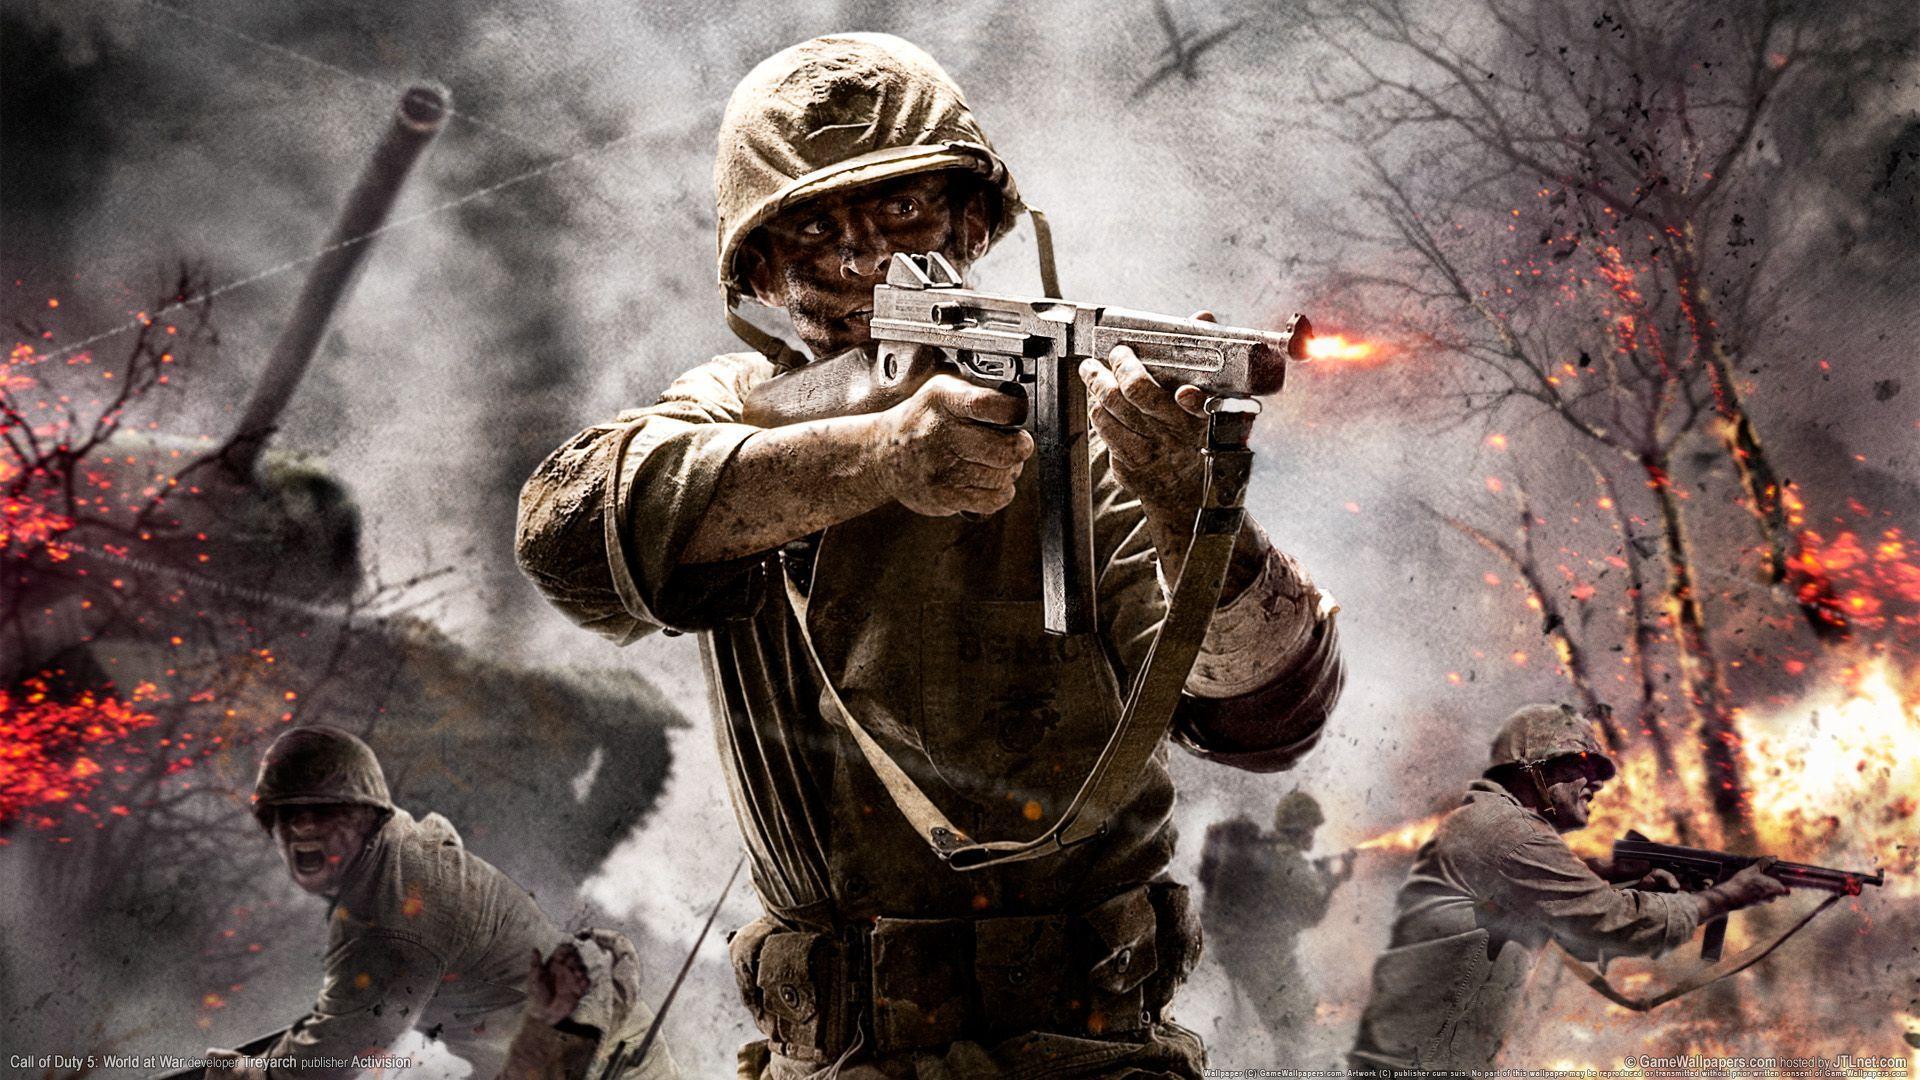 Call of Duty World at War Wallpaper HD 1